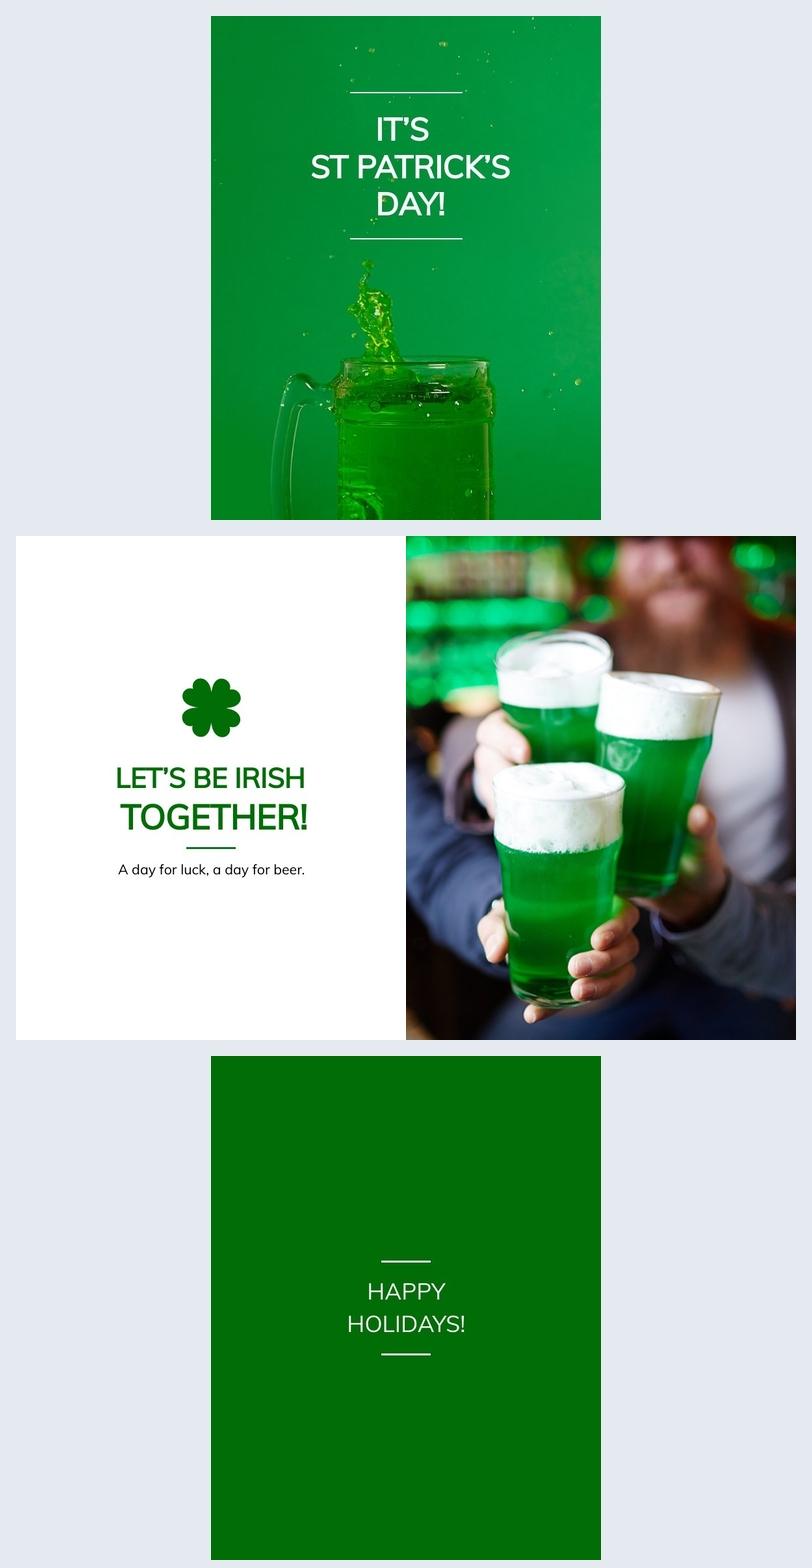 Lustige St. Patrick's Day Kartenidee